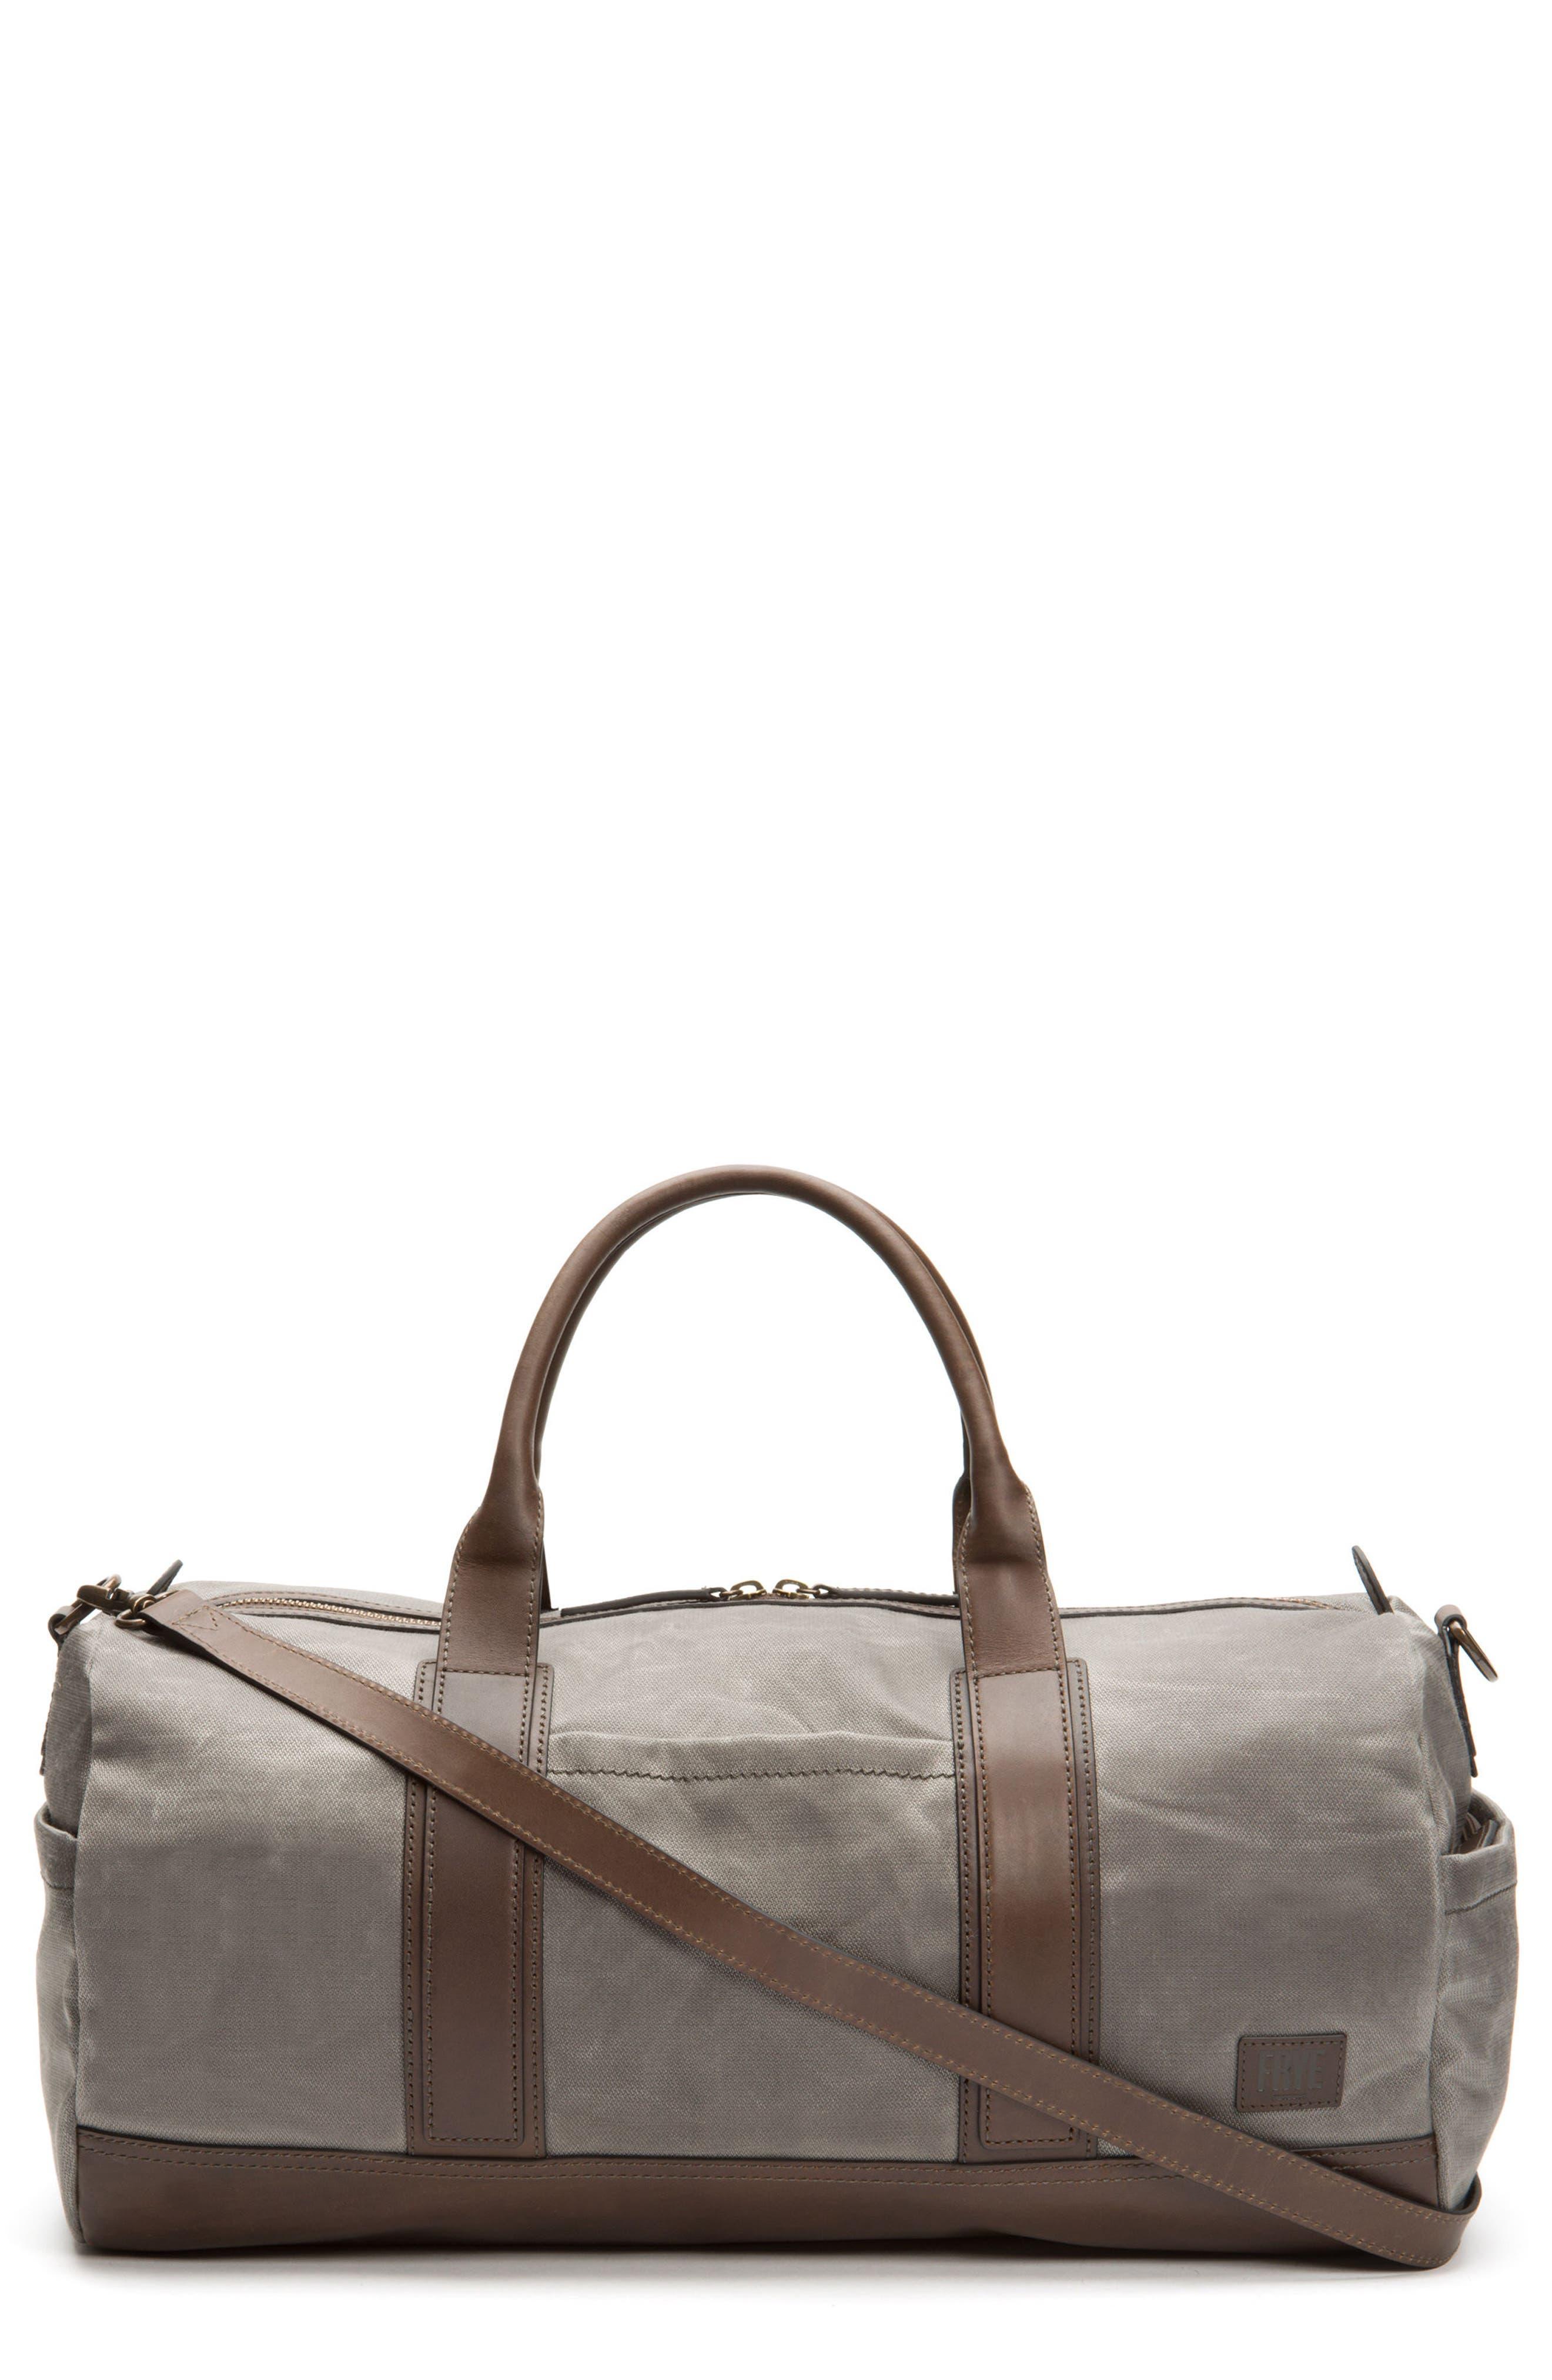 Frye Carter Duffel Bag